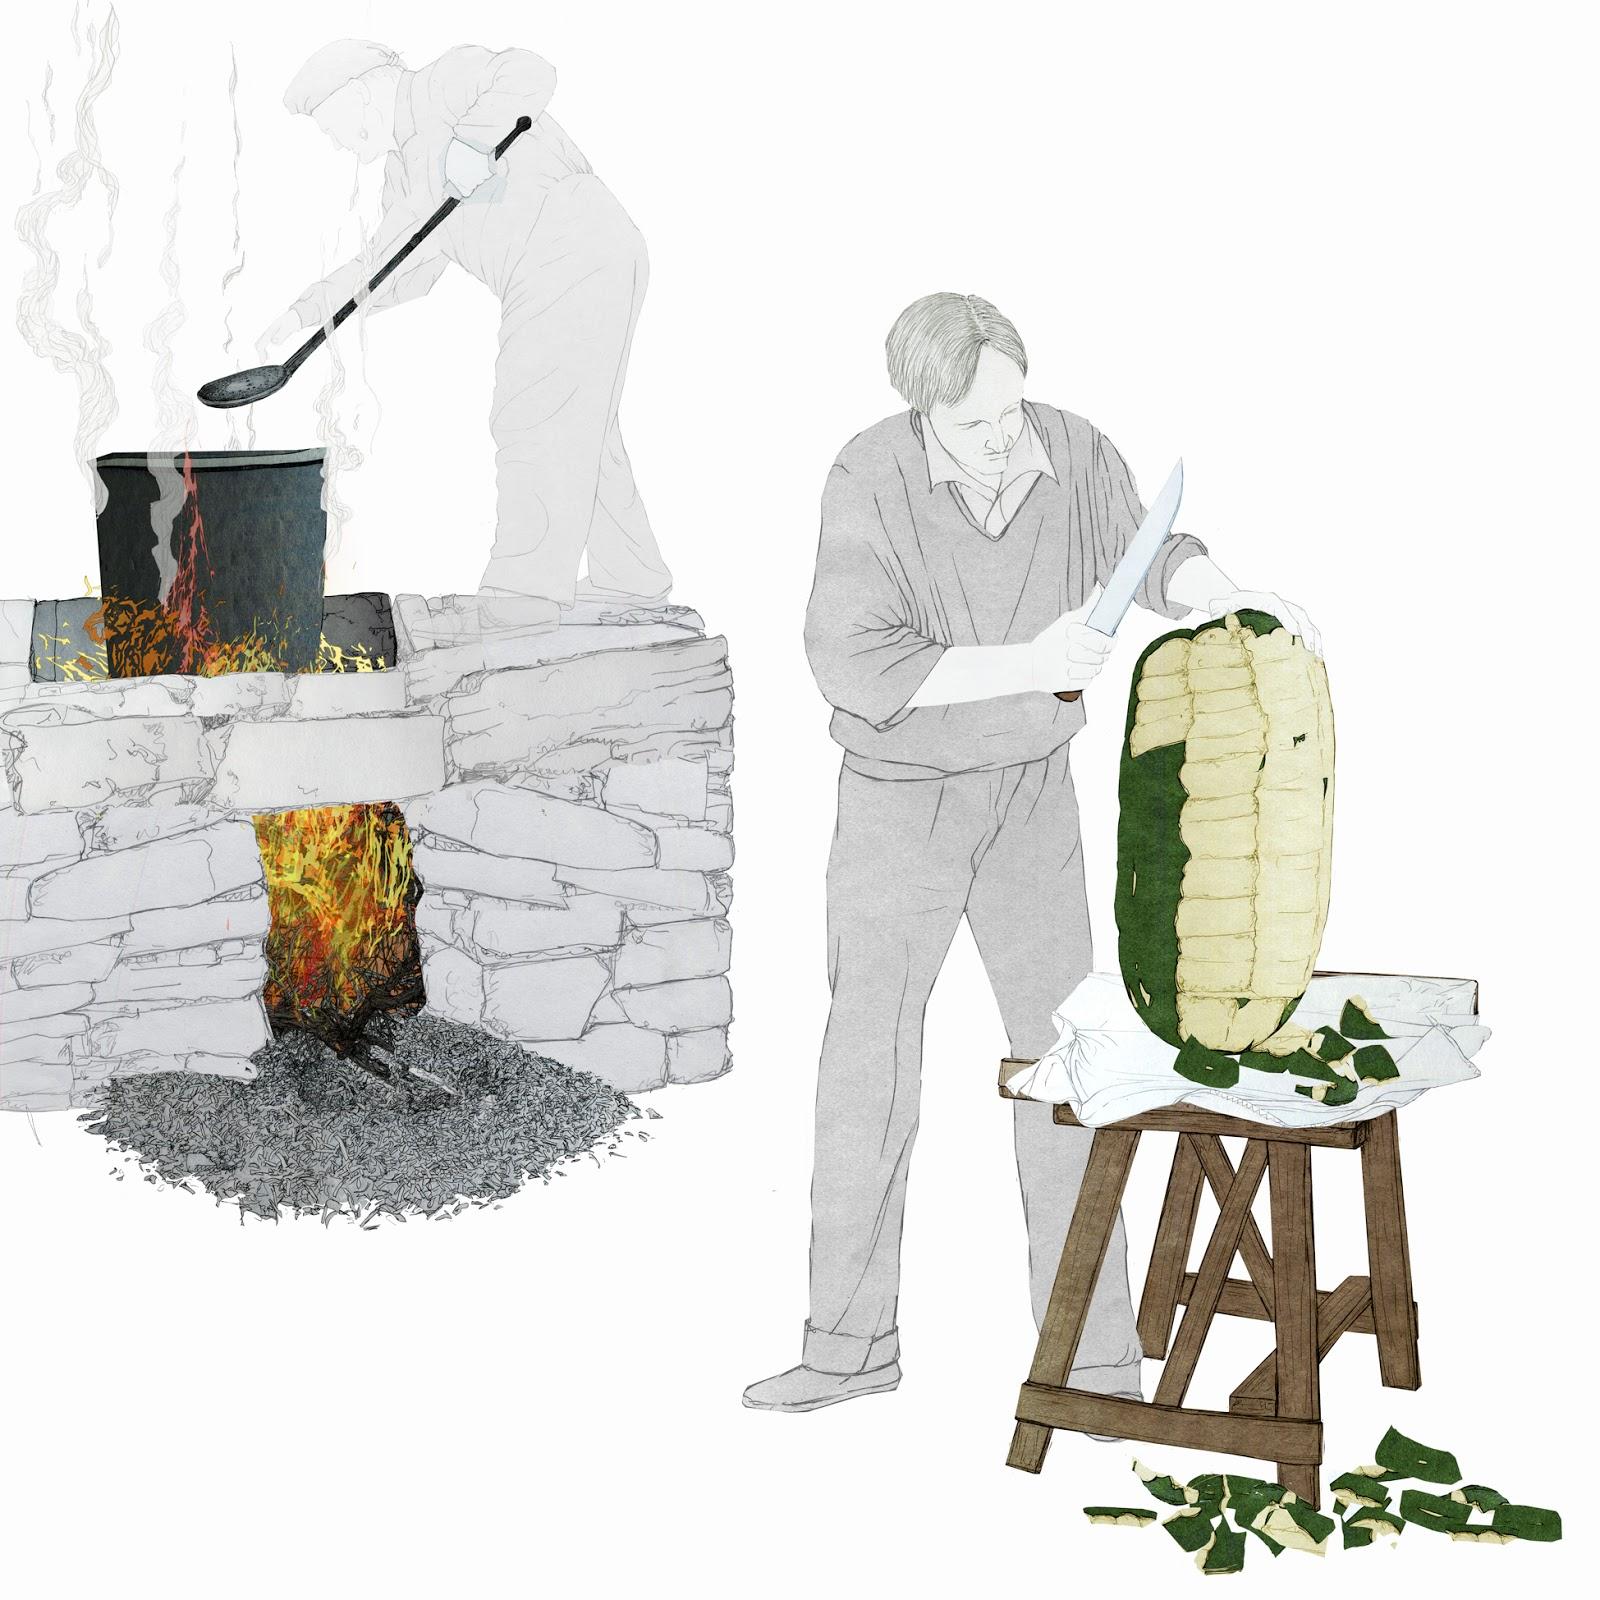 fuego, caldeo,  arrope, dulce tradicional,  valenciano, proceso, dibujo